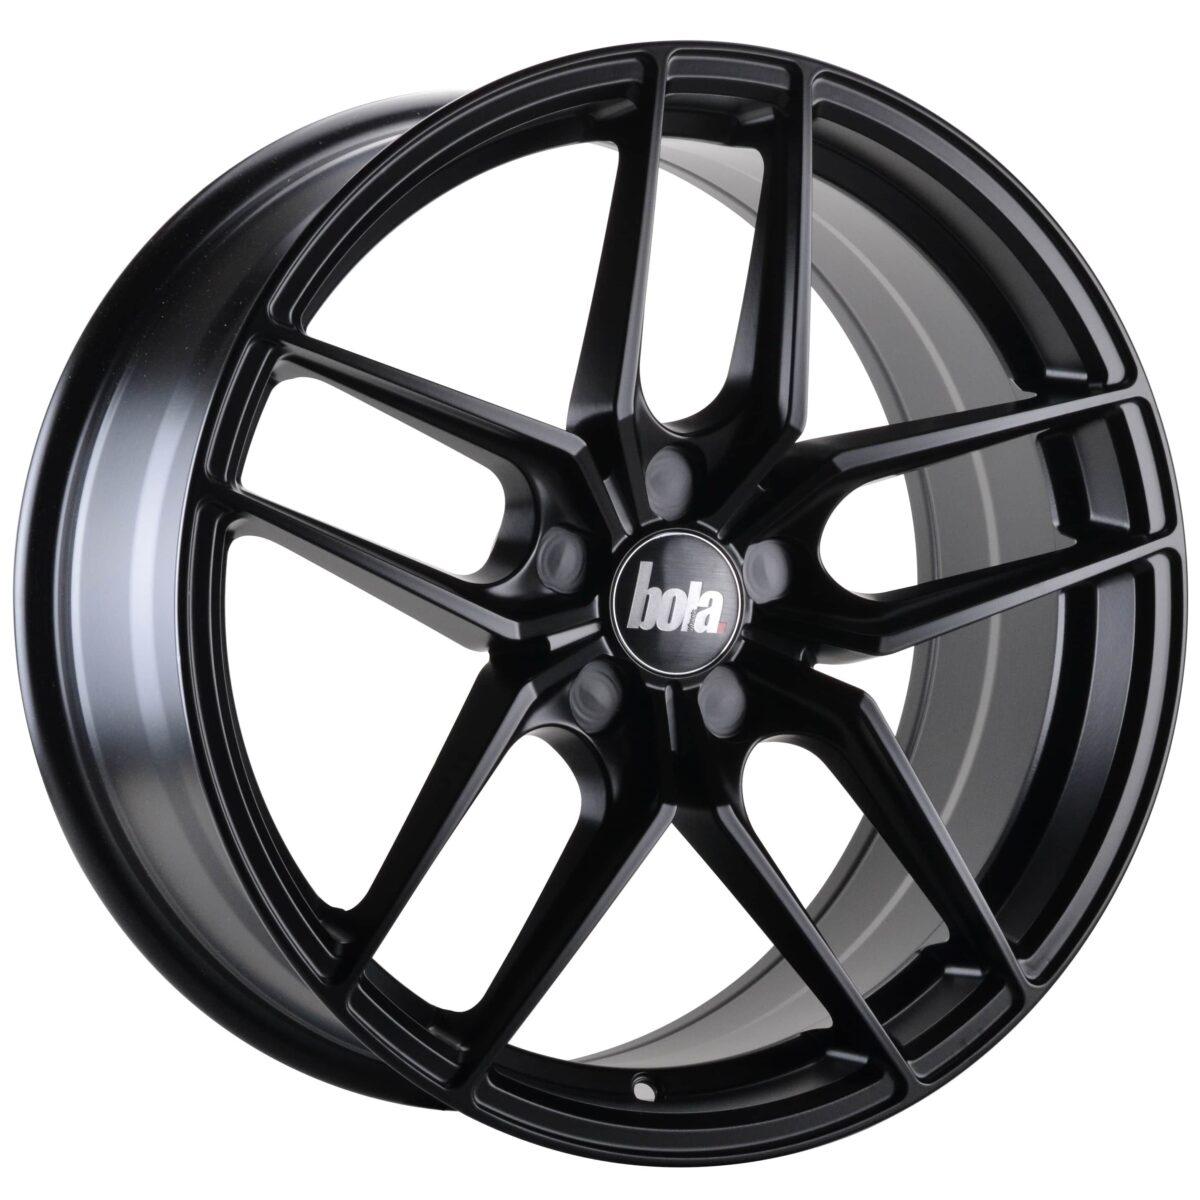 "19"" BOLA B11 Wheels - Matt Black - All BMW Models"